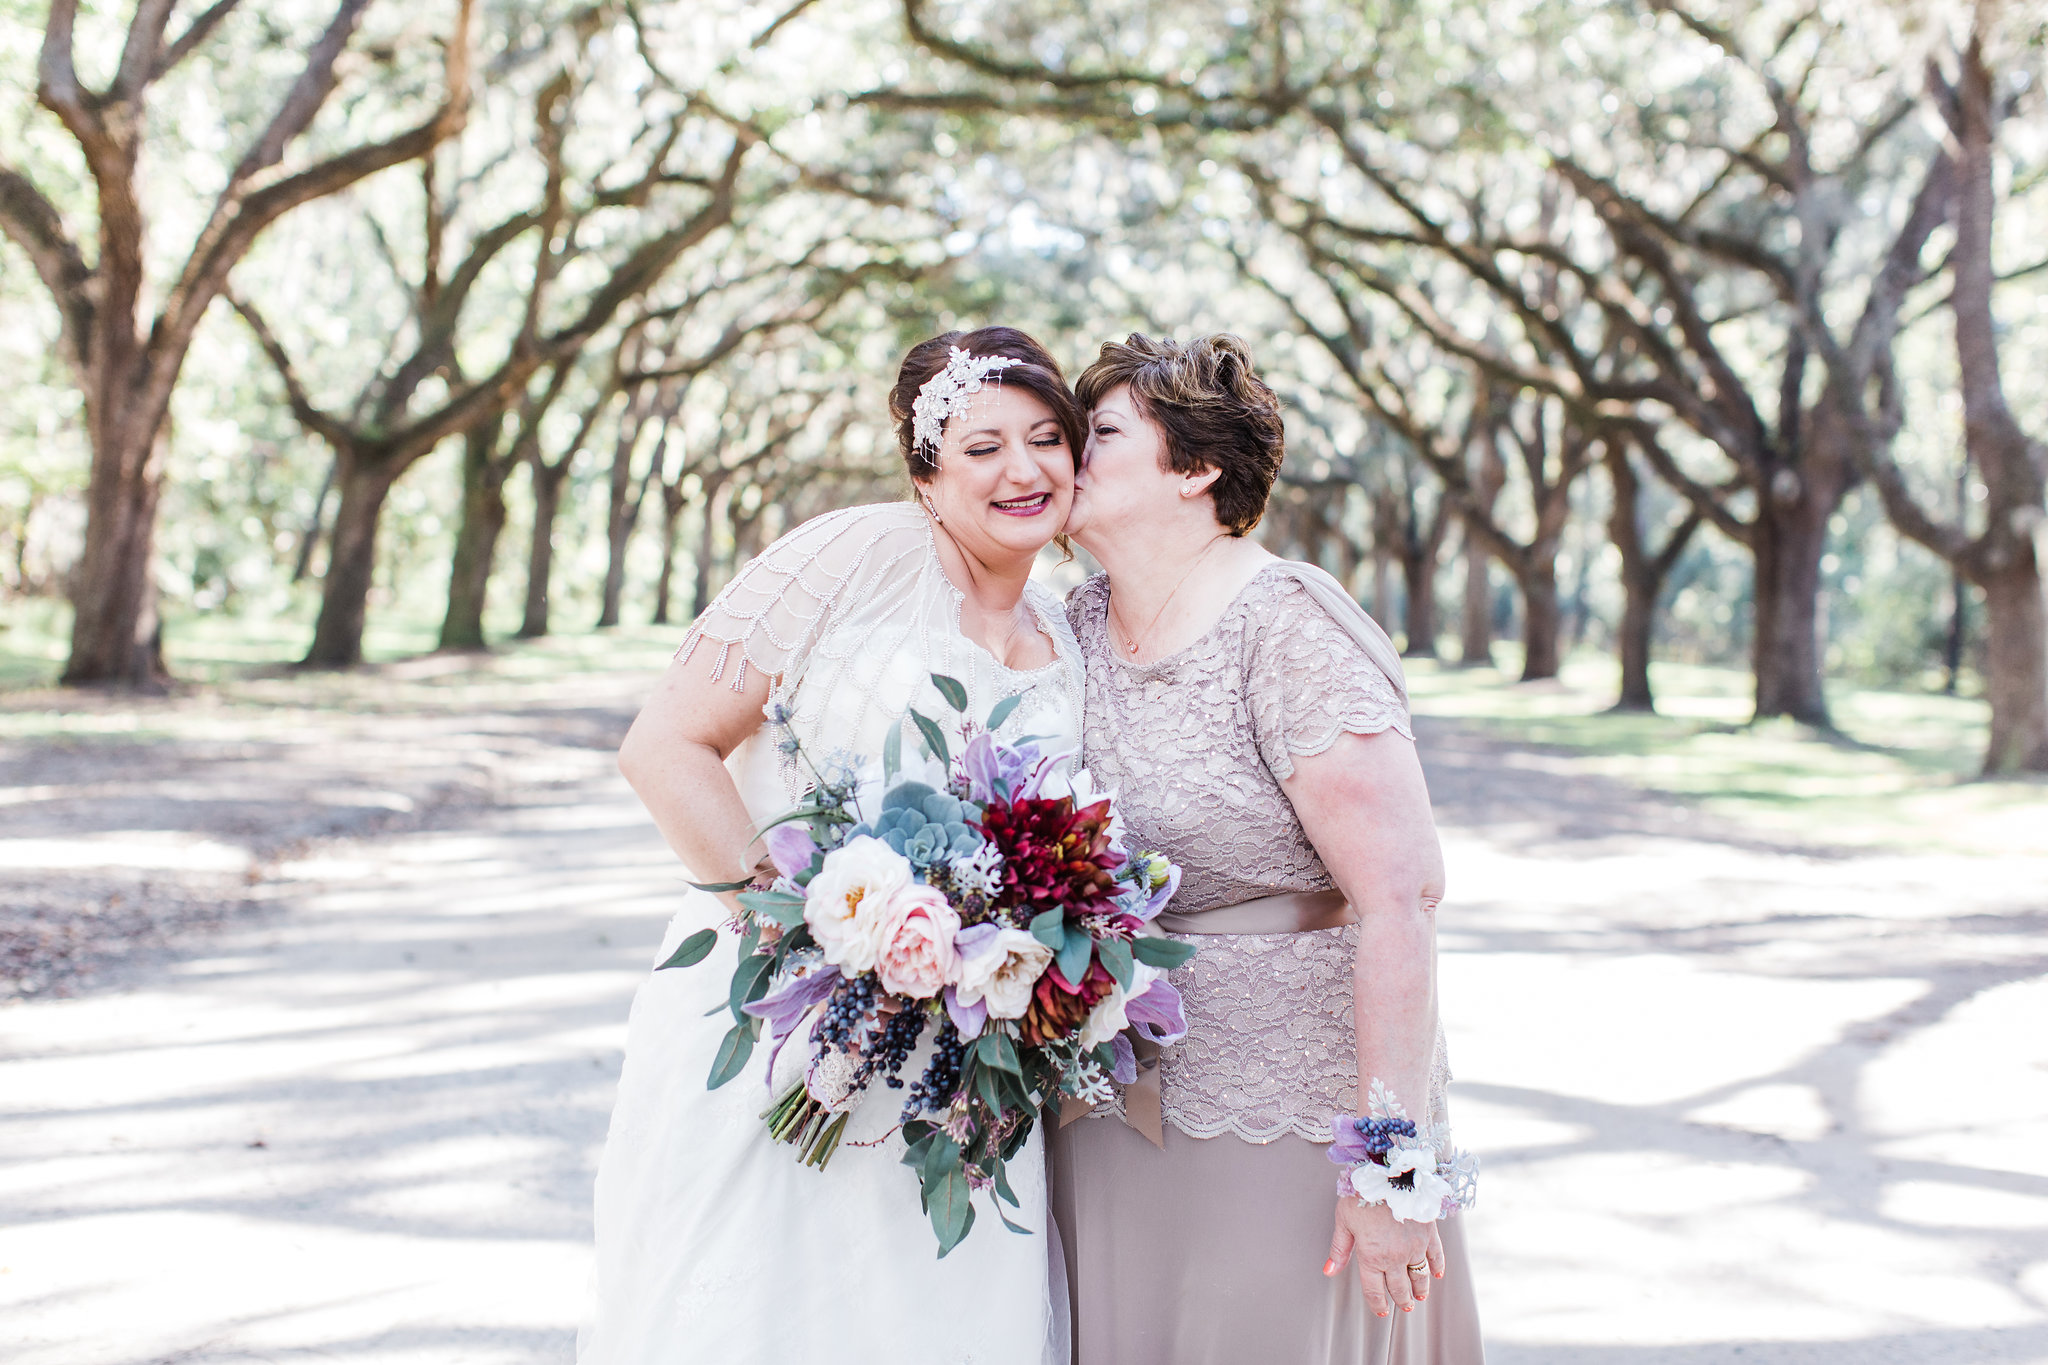 apt-b-photography-kristy-rob-wormsloe-elopment-savannah-wedding-photographer-savannah-elopement-wormsloe-wedding-historic-savannah-elopement-photographer-22.jpg